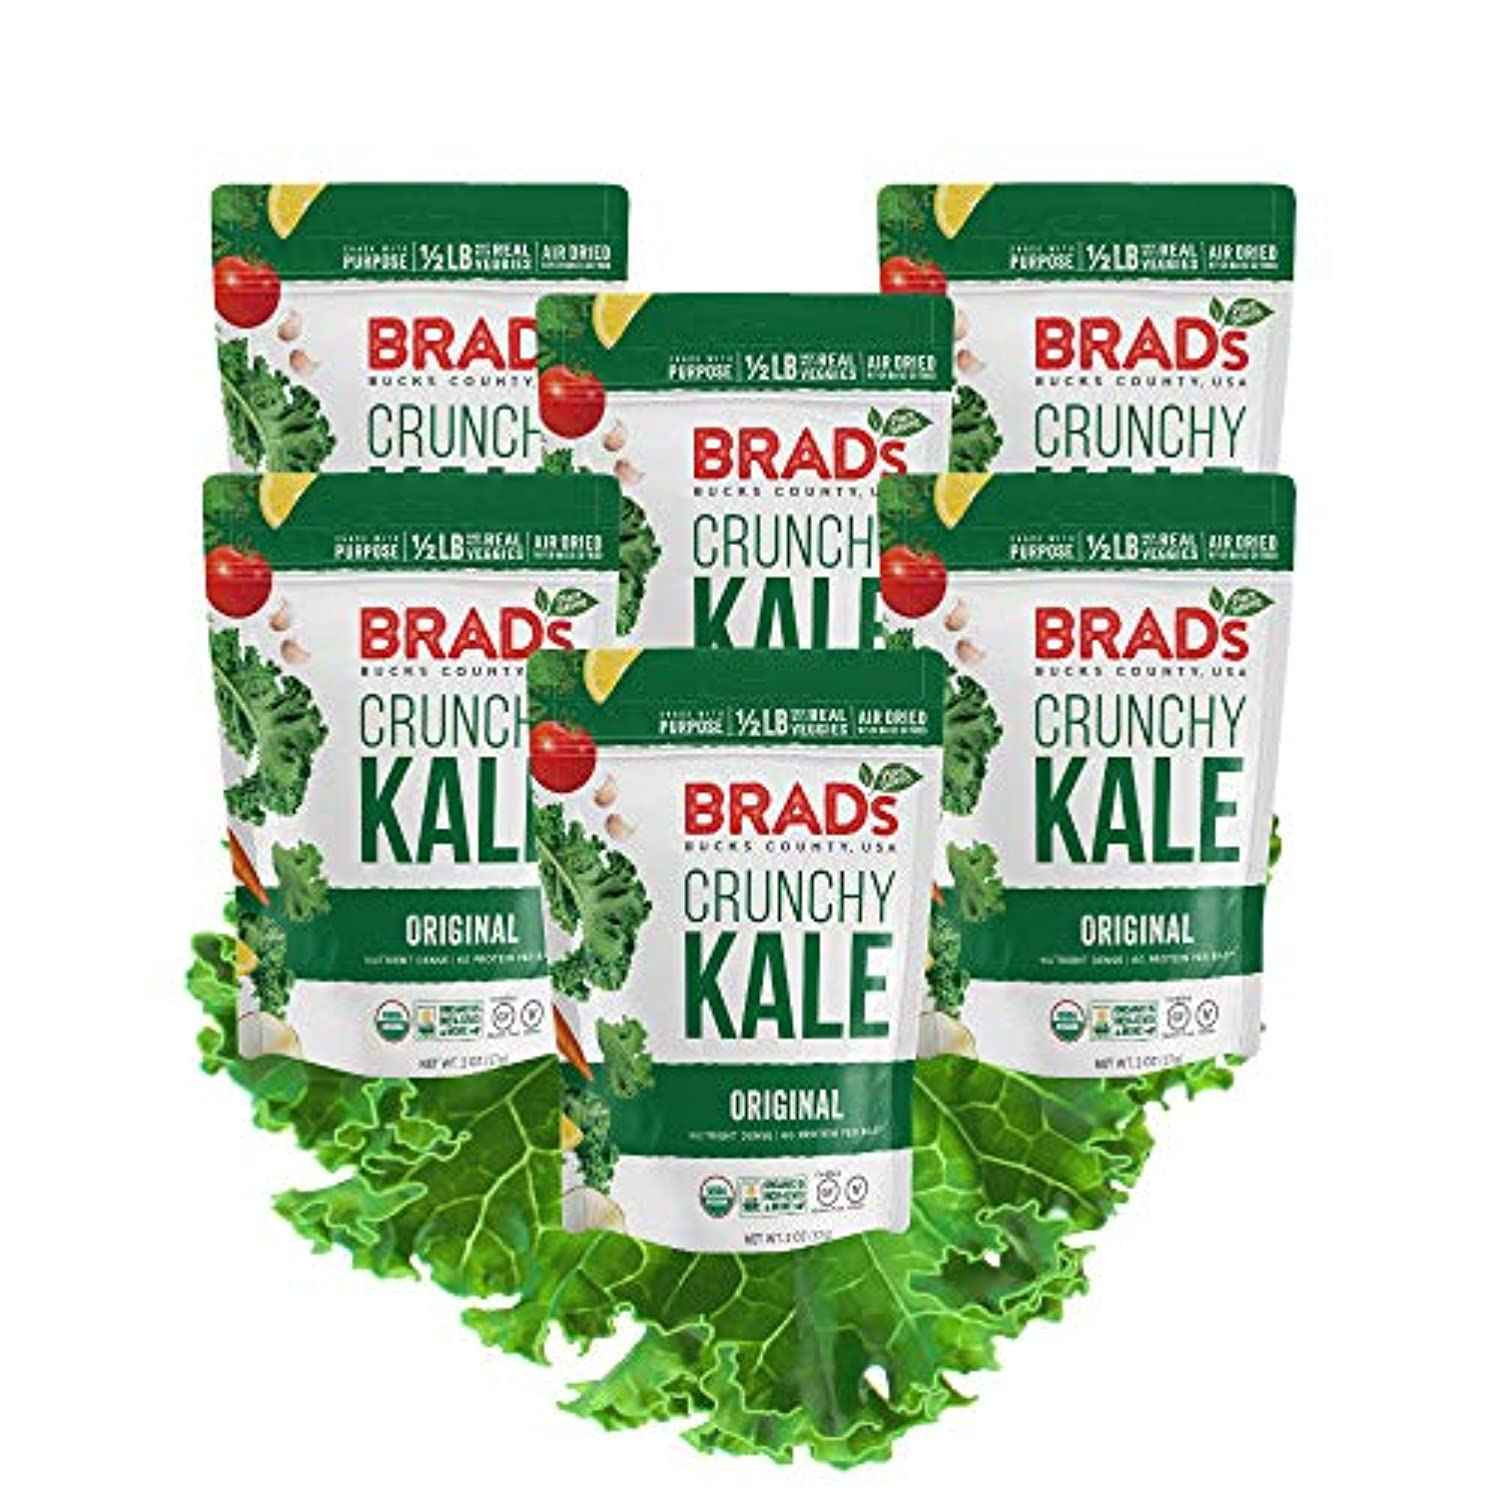 Brad's Plant Based Organic Crunchy Kale, Original, 6Count